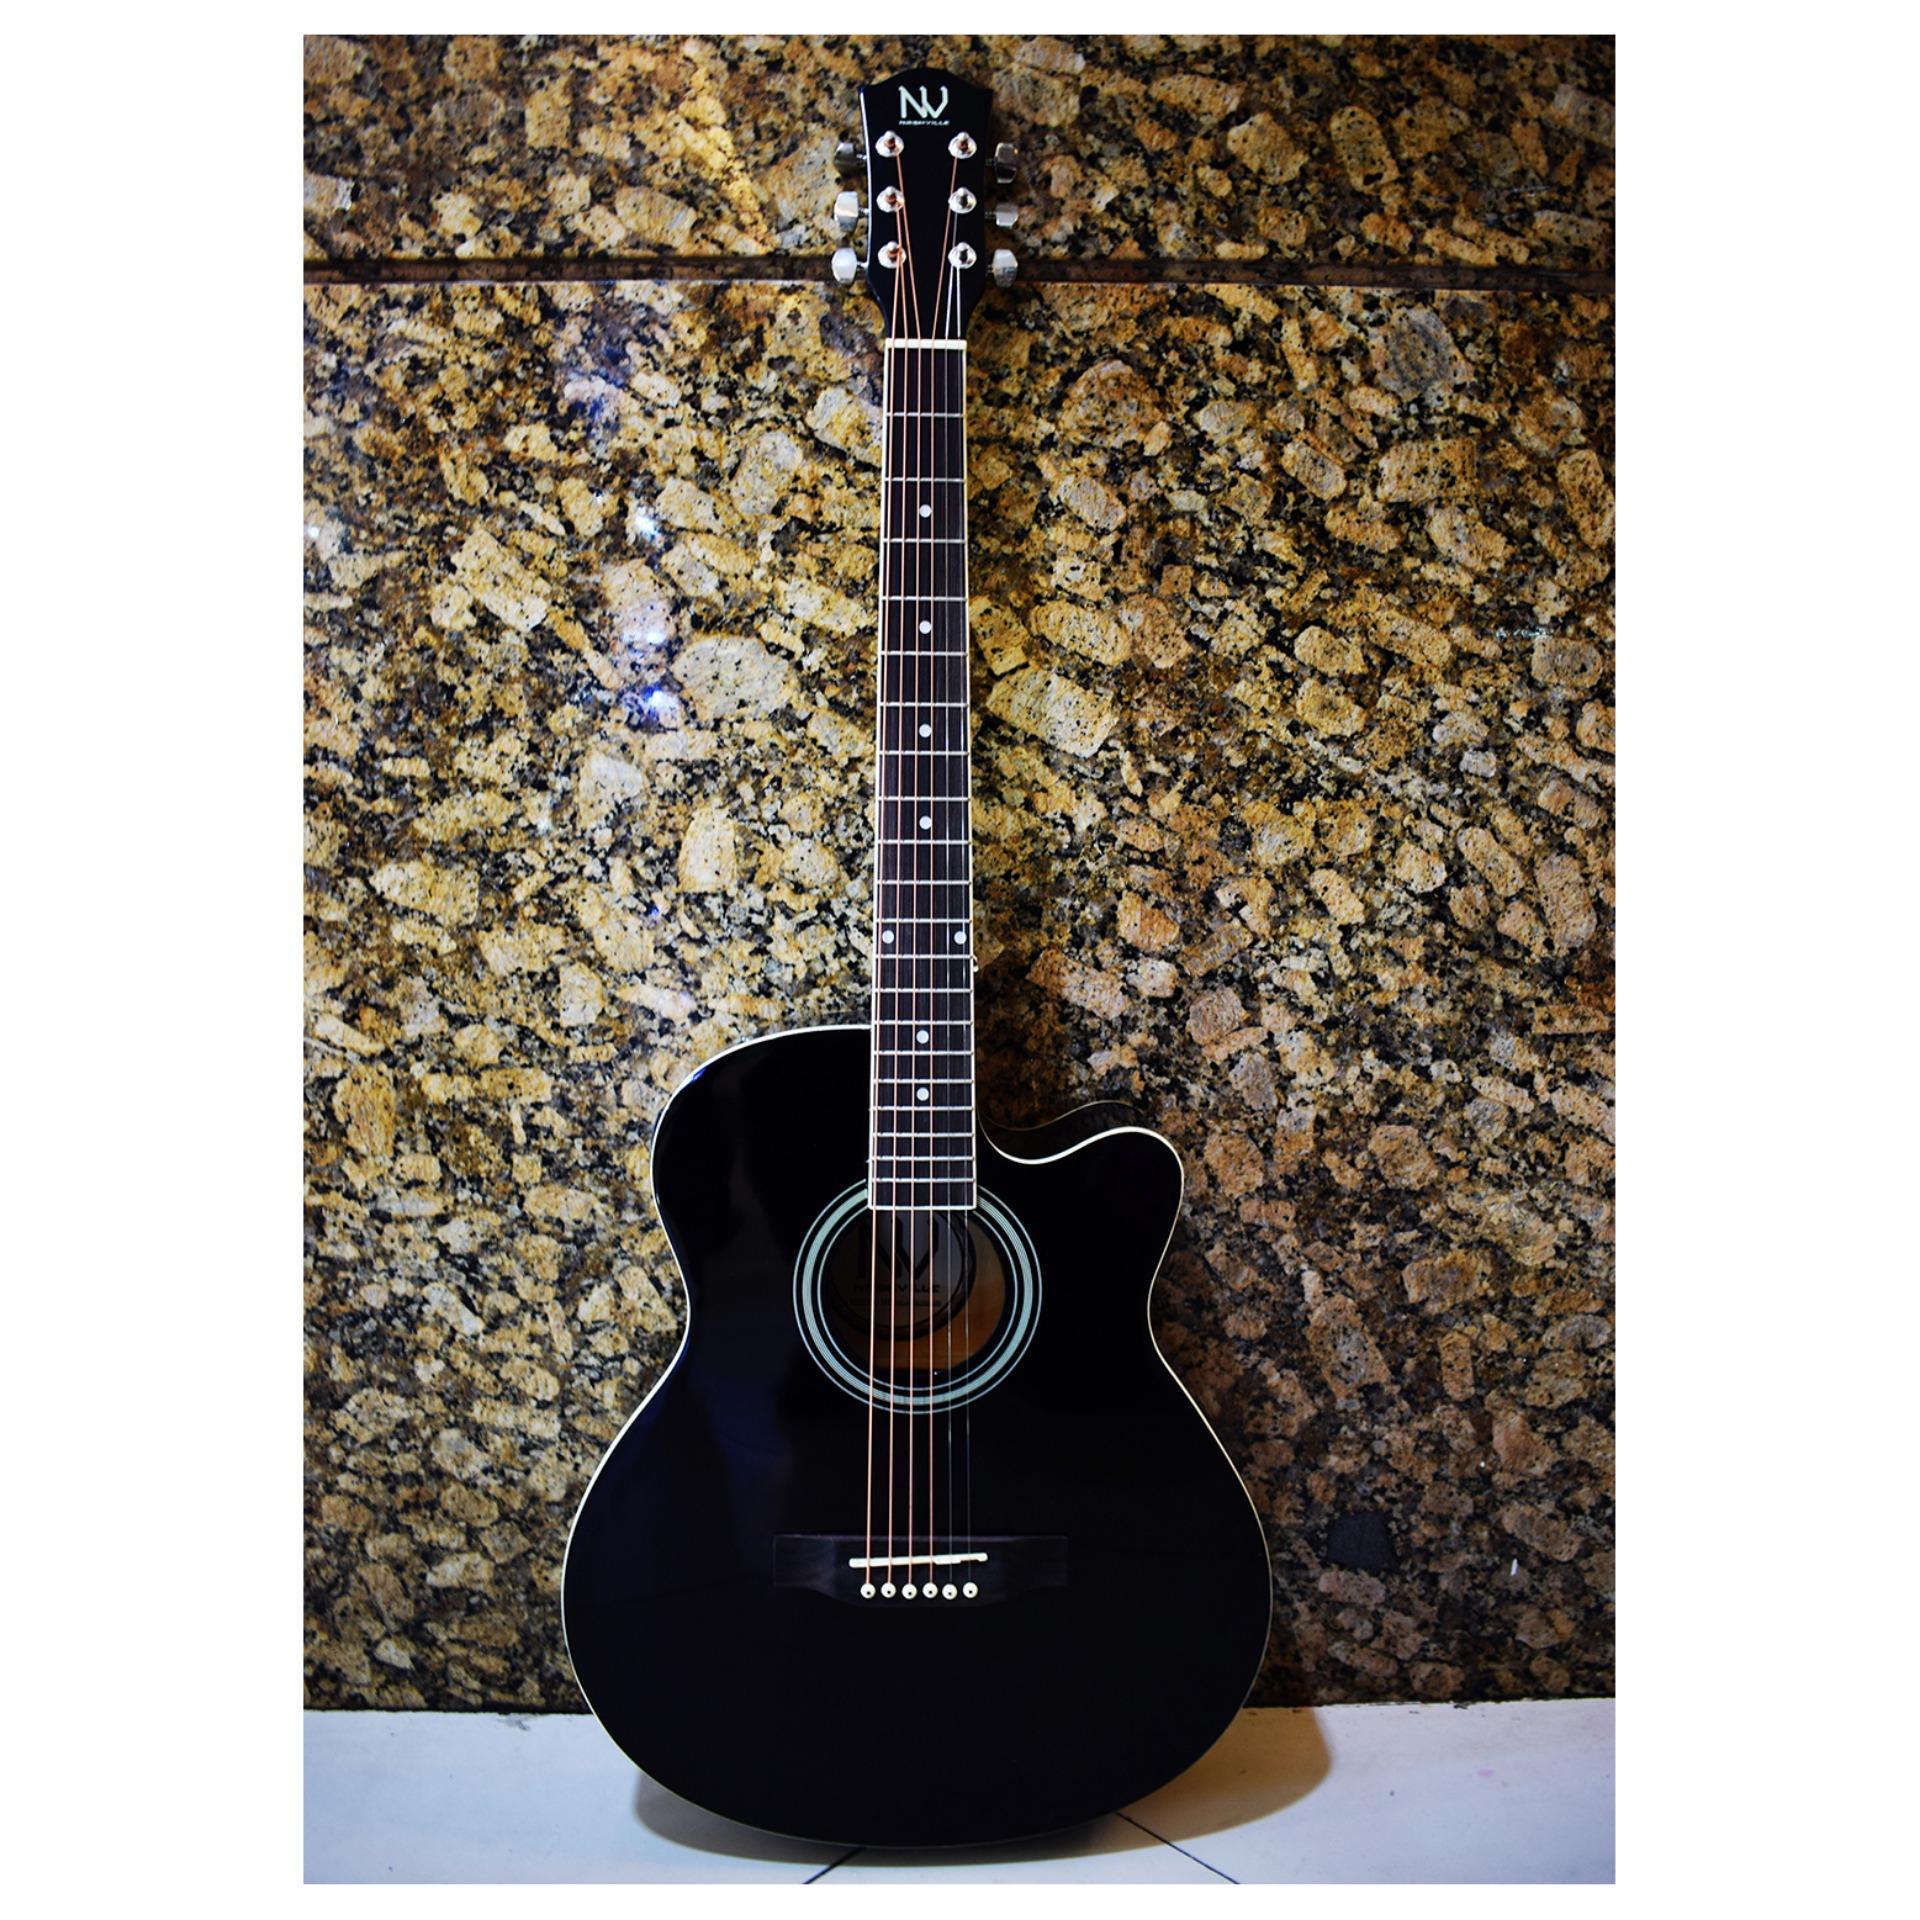 Jh Acoustic 5 Band Eq Equalizer Guitar Preamp Piezo Pickup Amplifier Source · Nashville Acoustic Electric